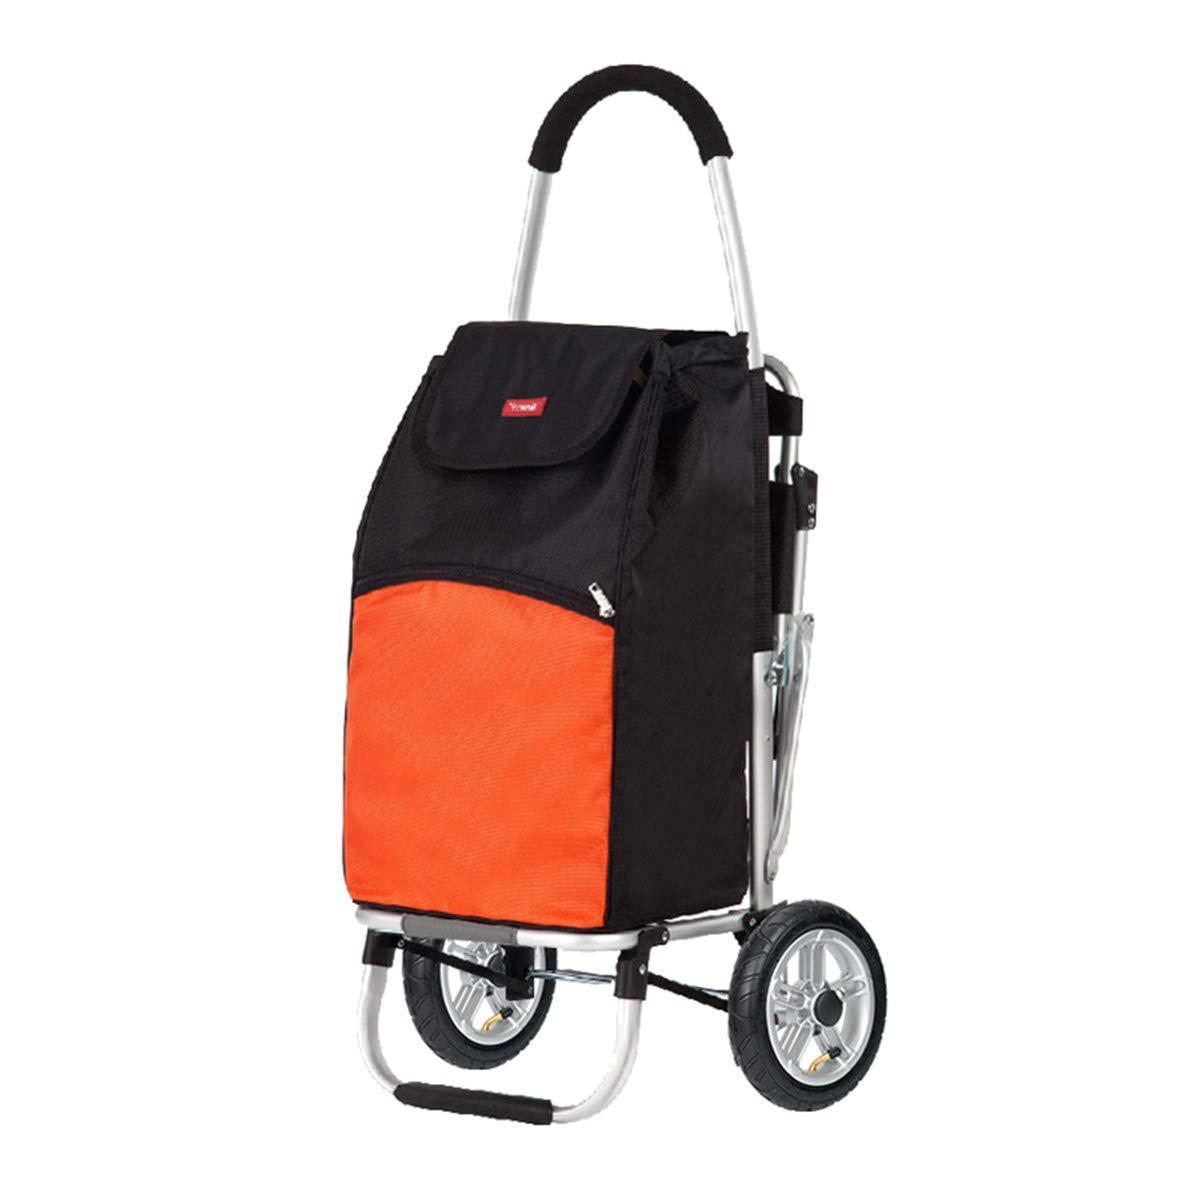 HSBAIS 座席付きショッピングカート、軽量 ショッピング用台車 防水 トロリー 49L容量/座席サポート75KG高齢者向け,Orange B07T8Y3GXN Orange